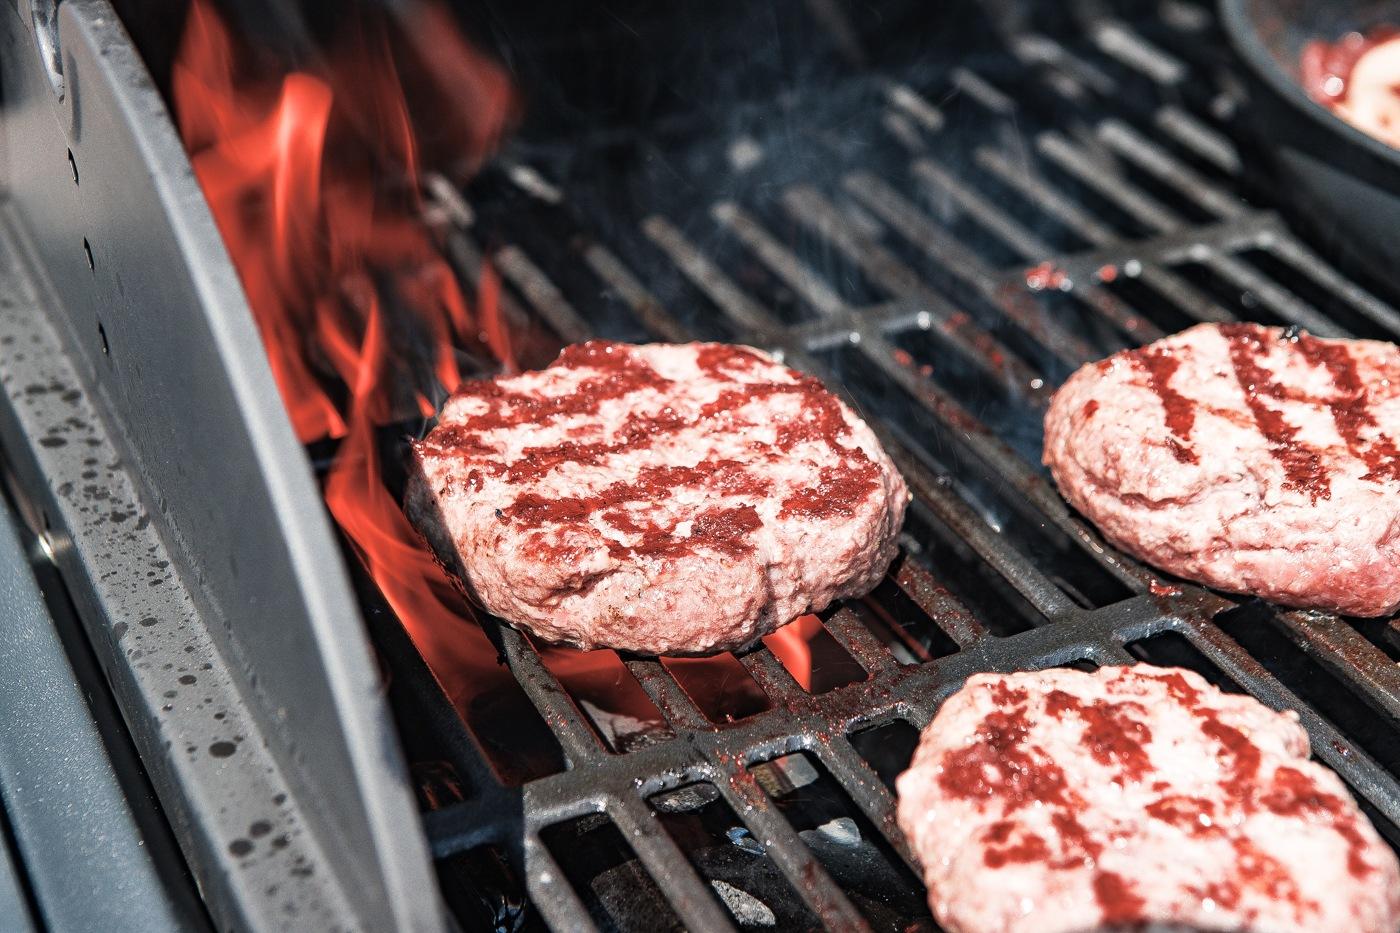 kerrygold-cheddar-burger-challenge-2018-23